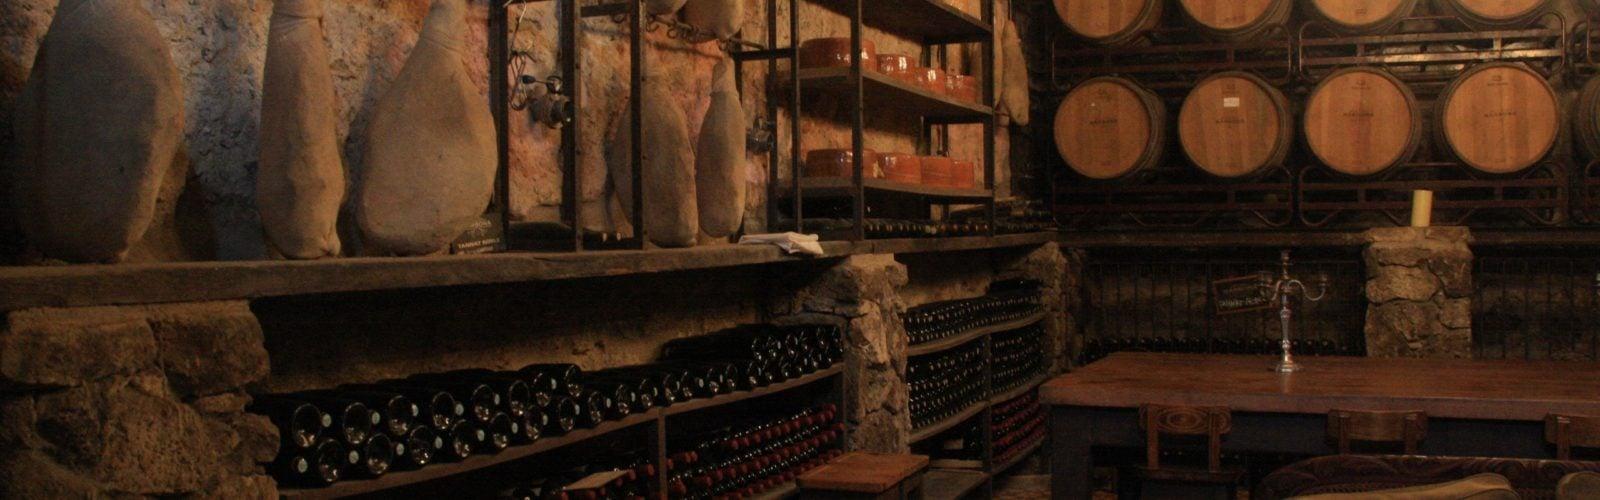 Finca Narbona Wine Cave, Uruguay, Carmelo